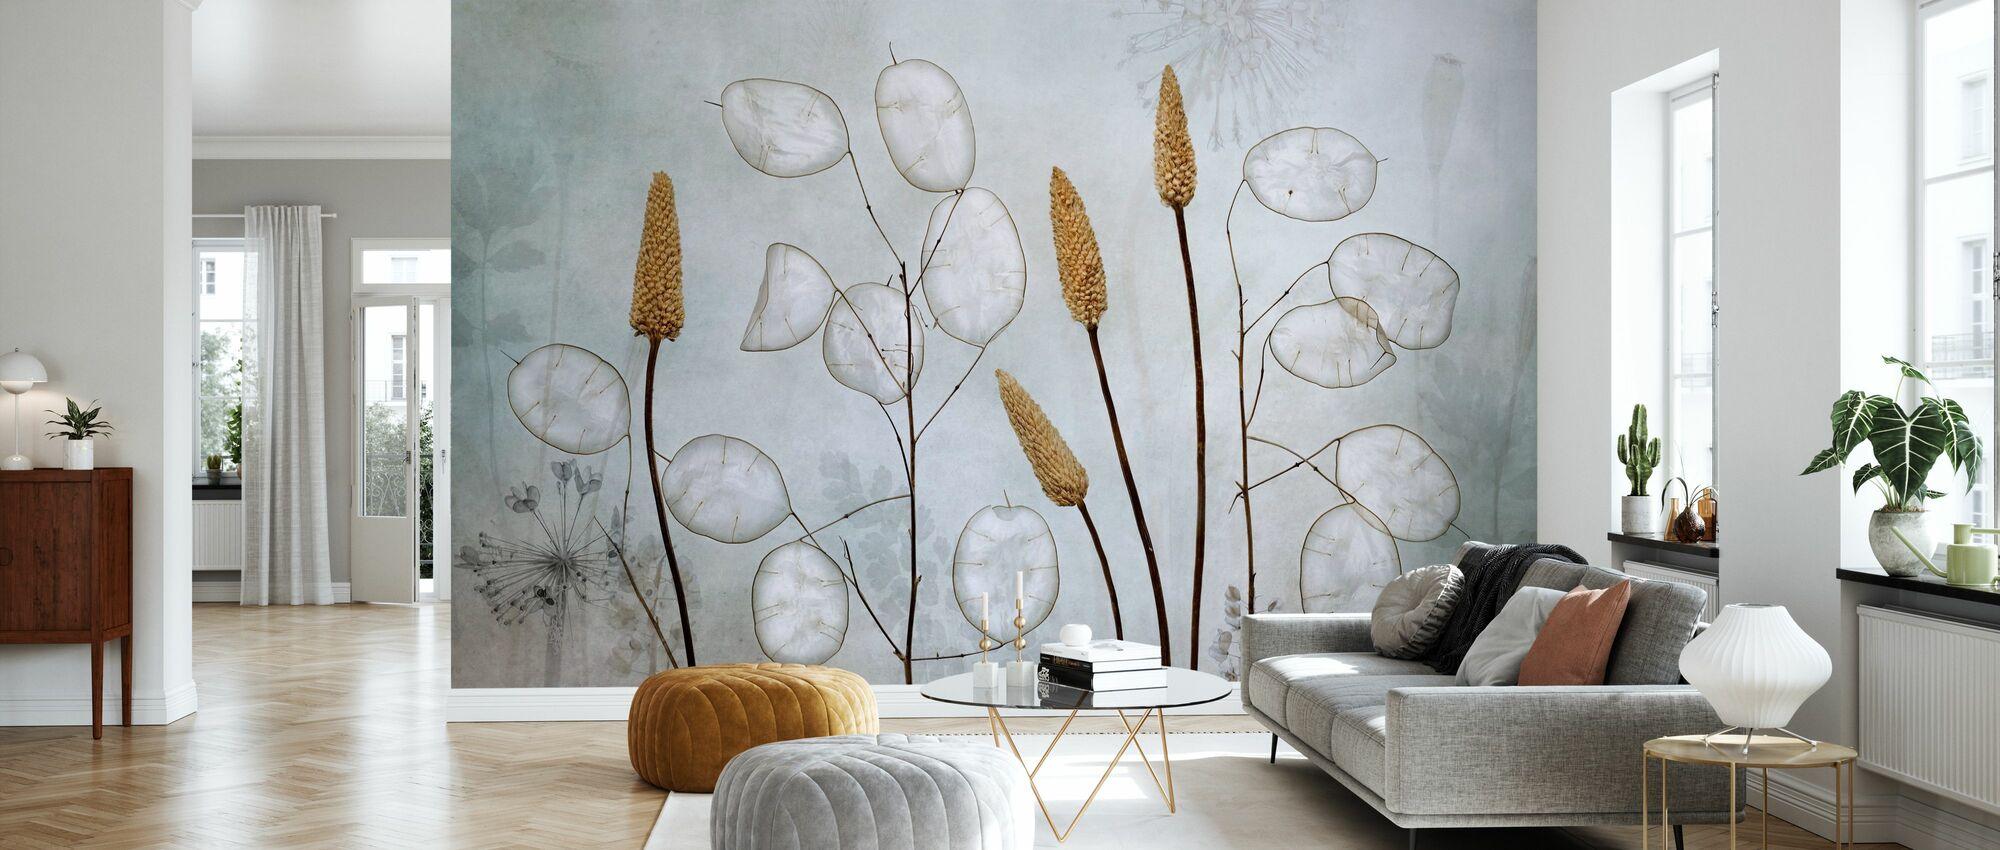 Lunaria - Wallpaper - Living Room